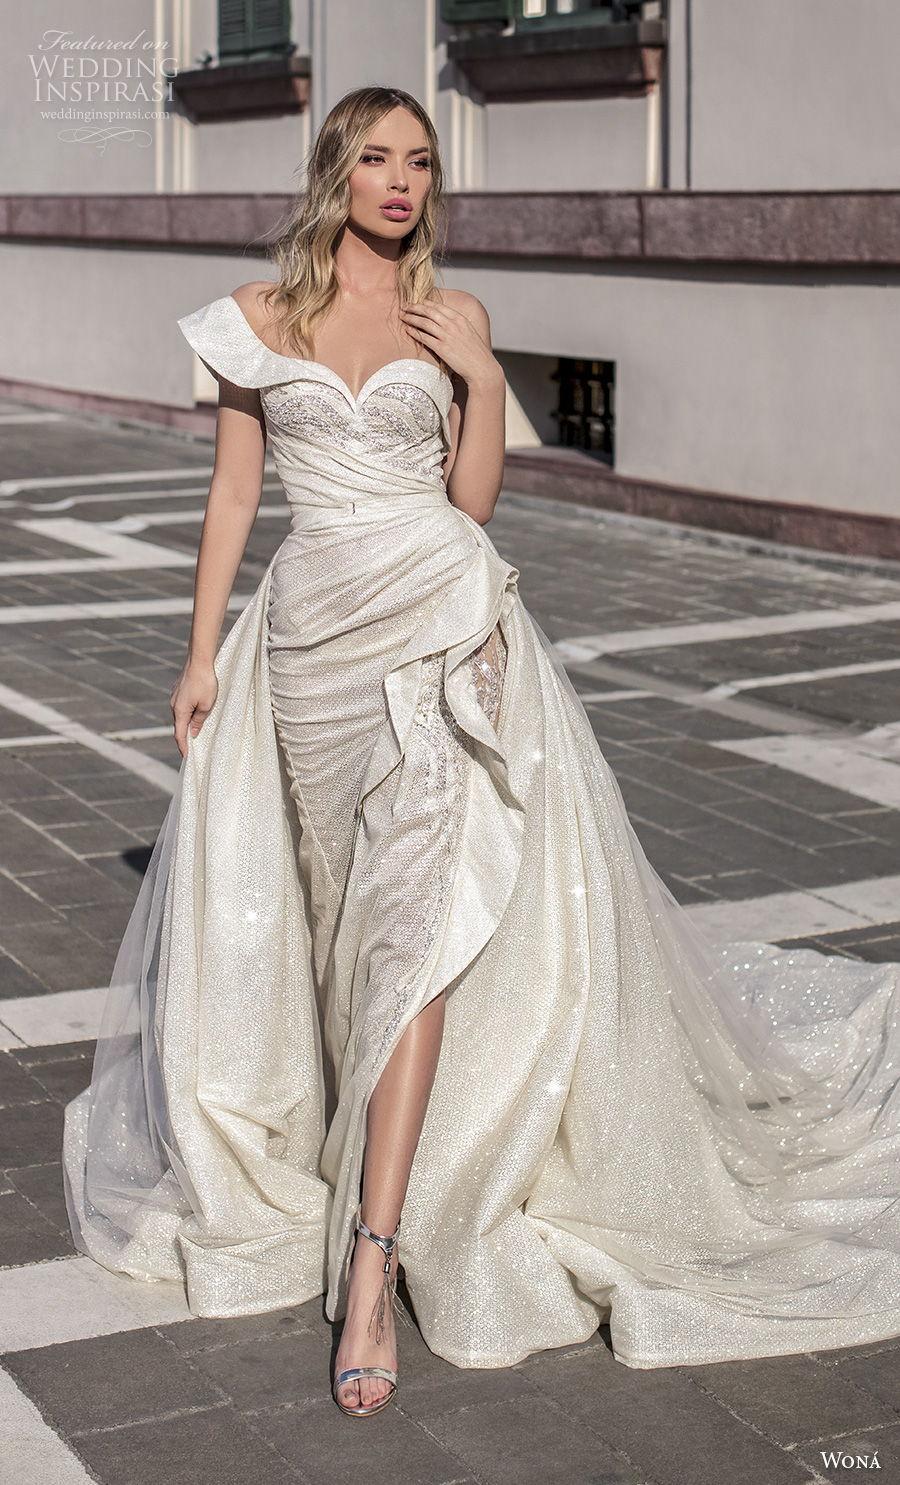 wona 2020 couture bridal one shoulder sweetheart neckline heavily embellished bodice slit skirt glamorous sheath wedding dress a line overskirt backless chapel train (10) mv